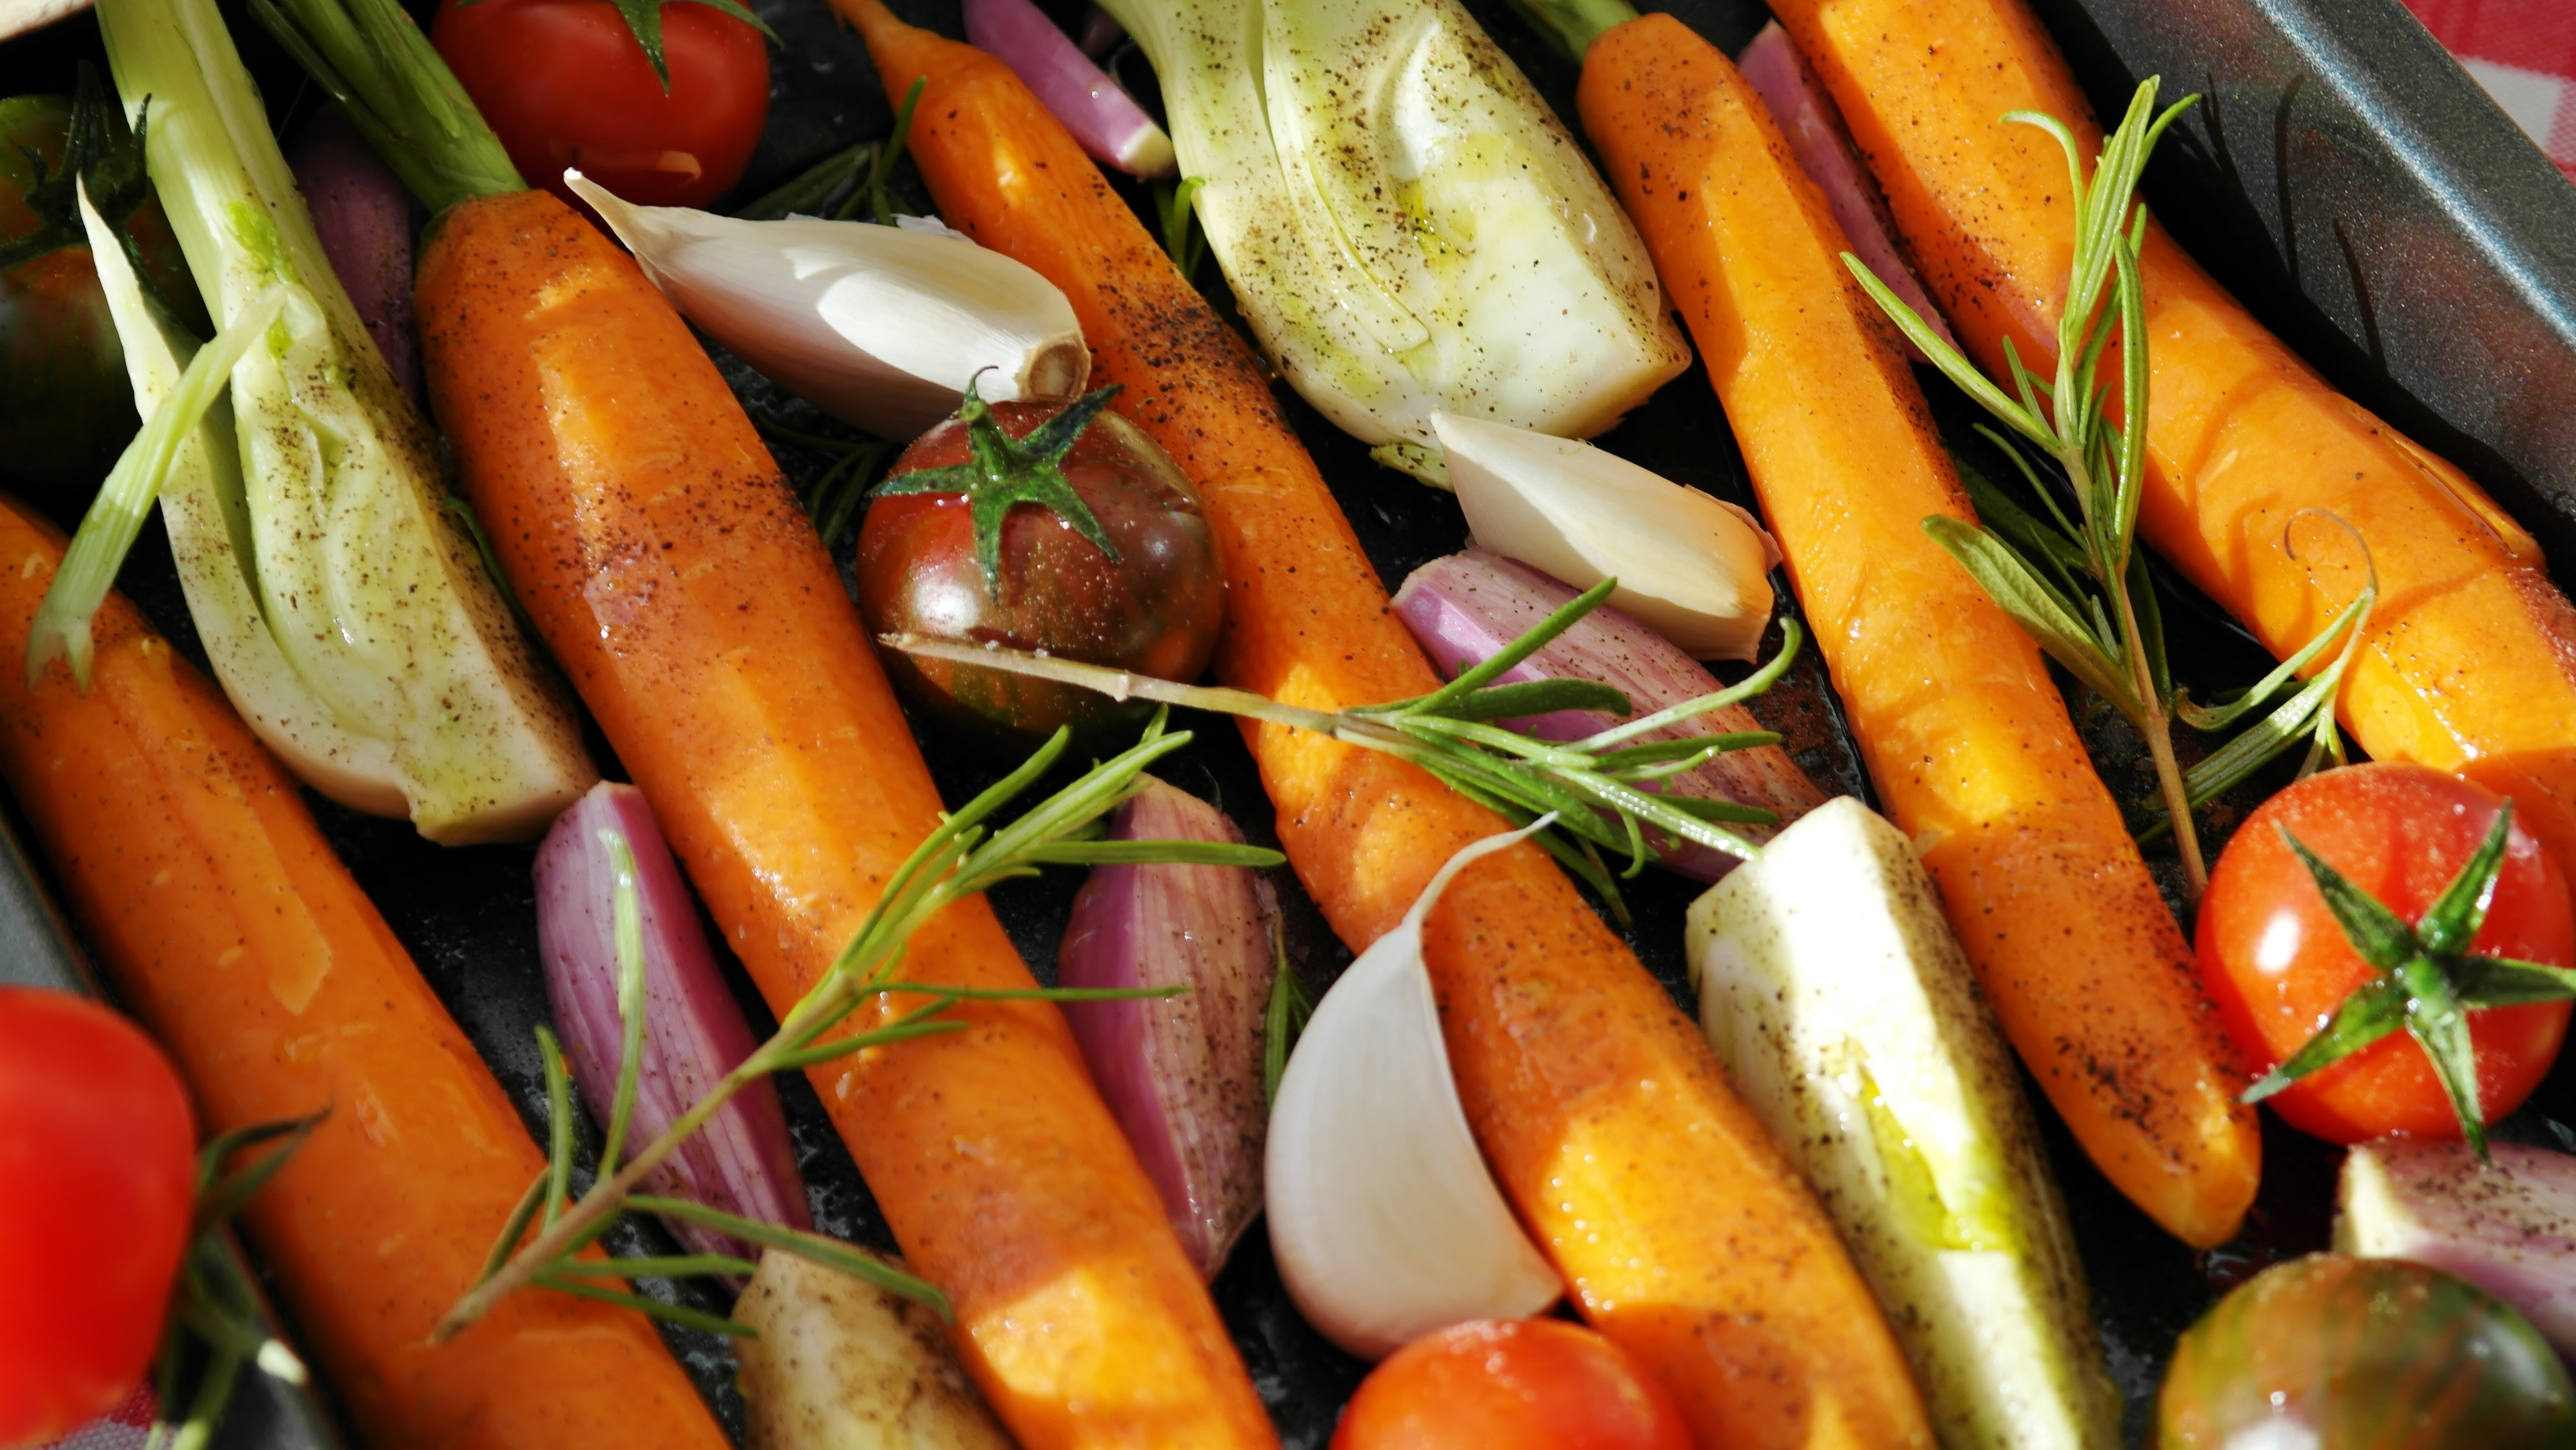 carrots-close-up-delicious-diet-208453